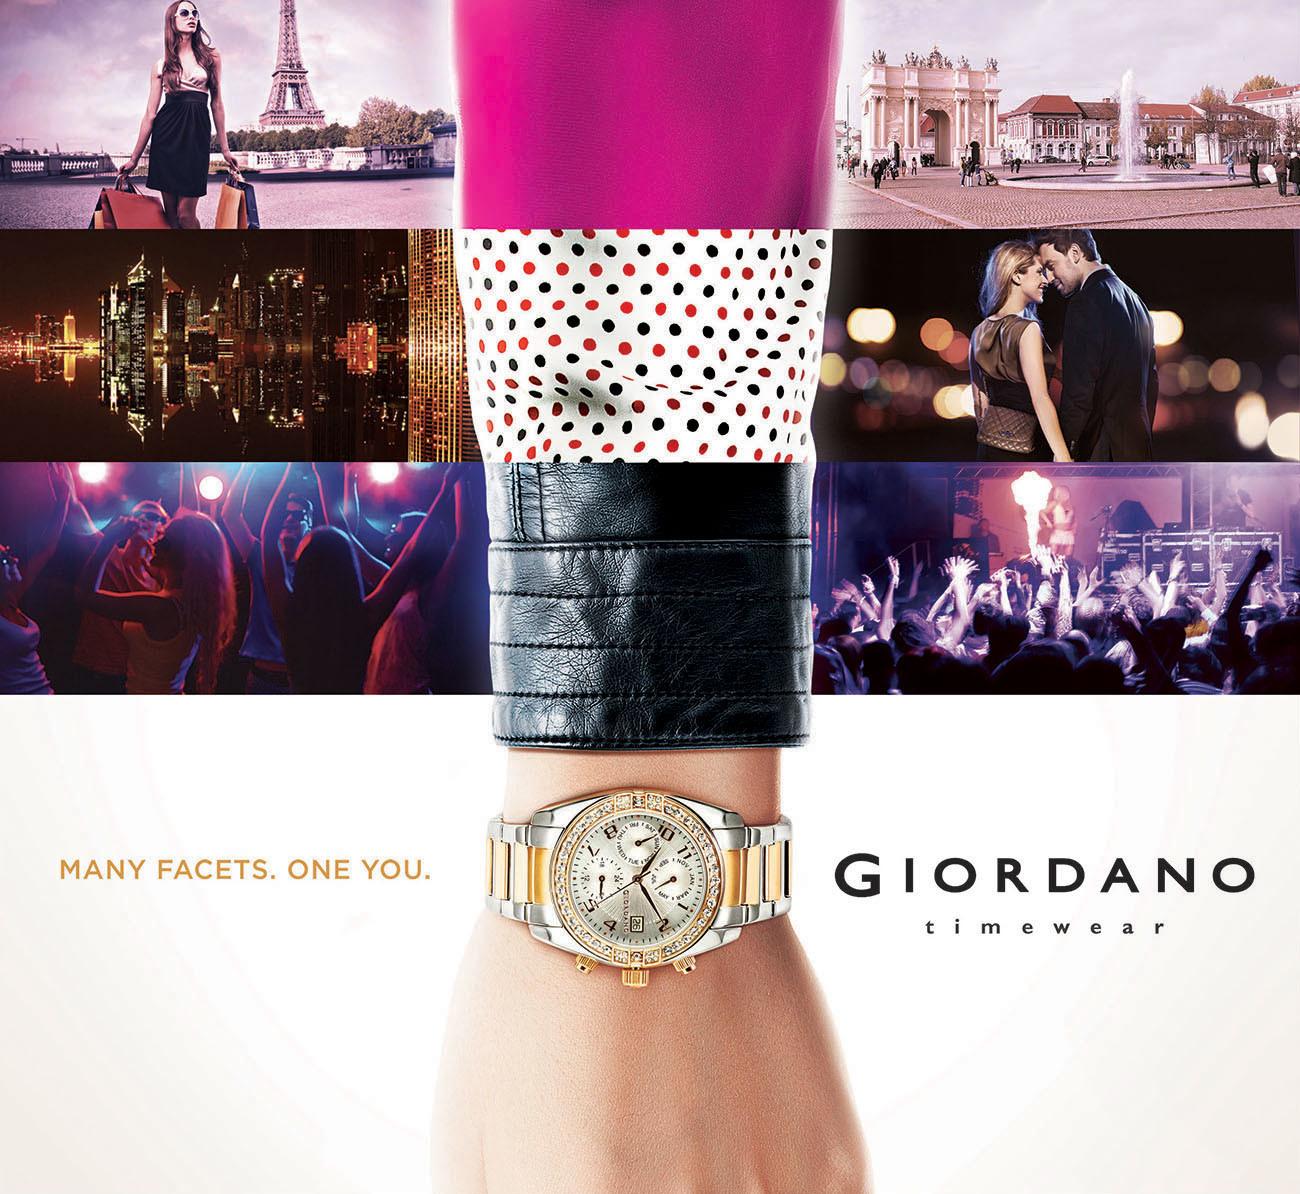 GIORDANO TIMEWEAR